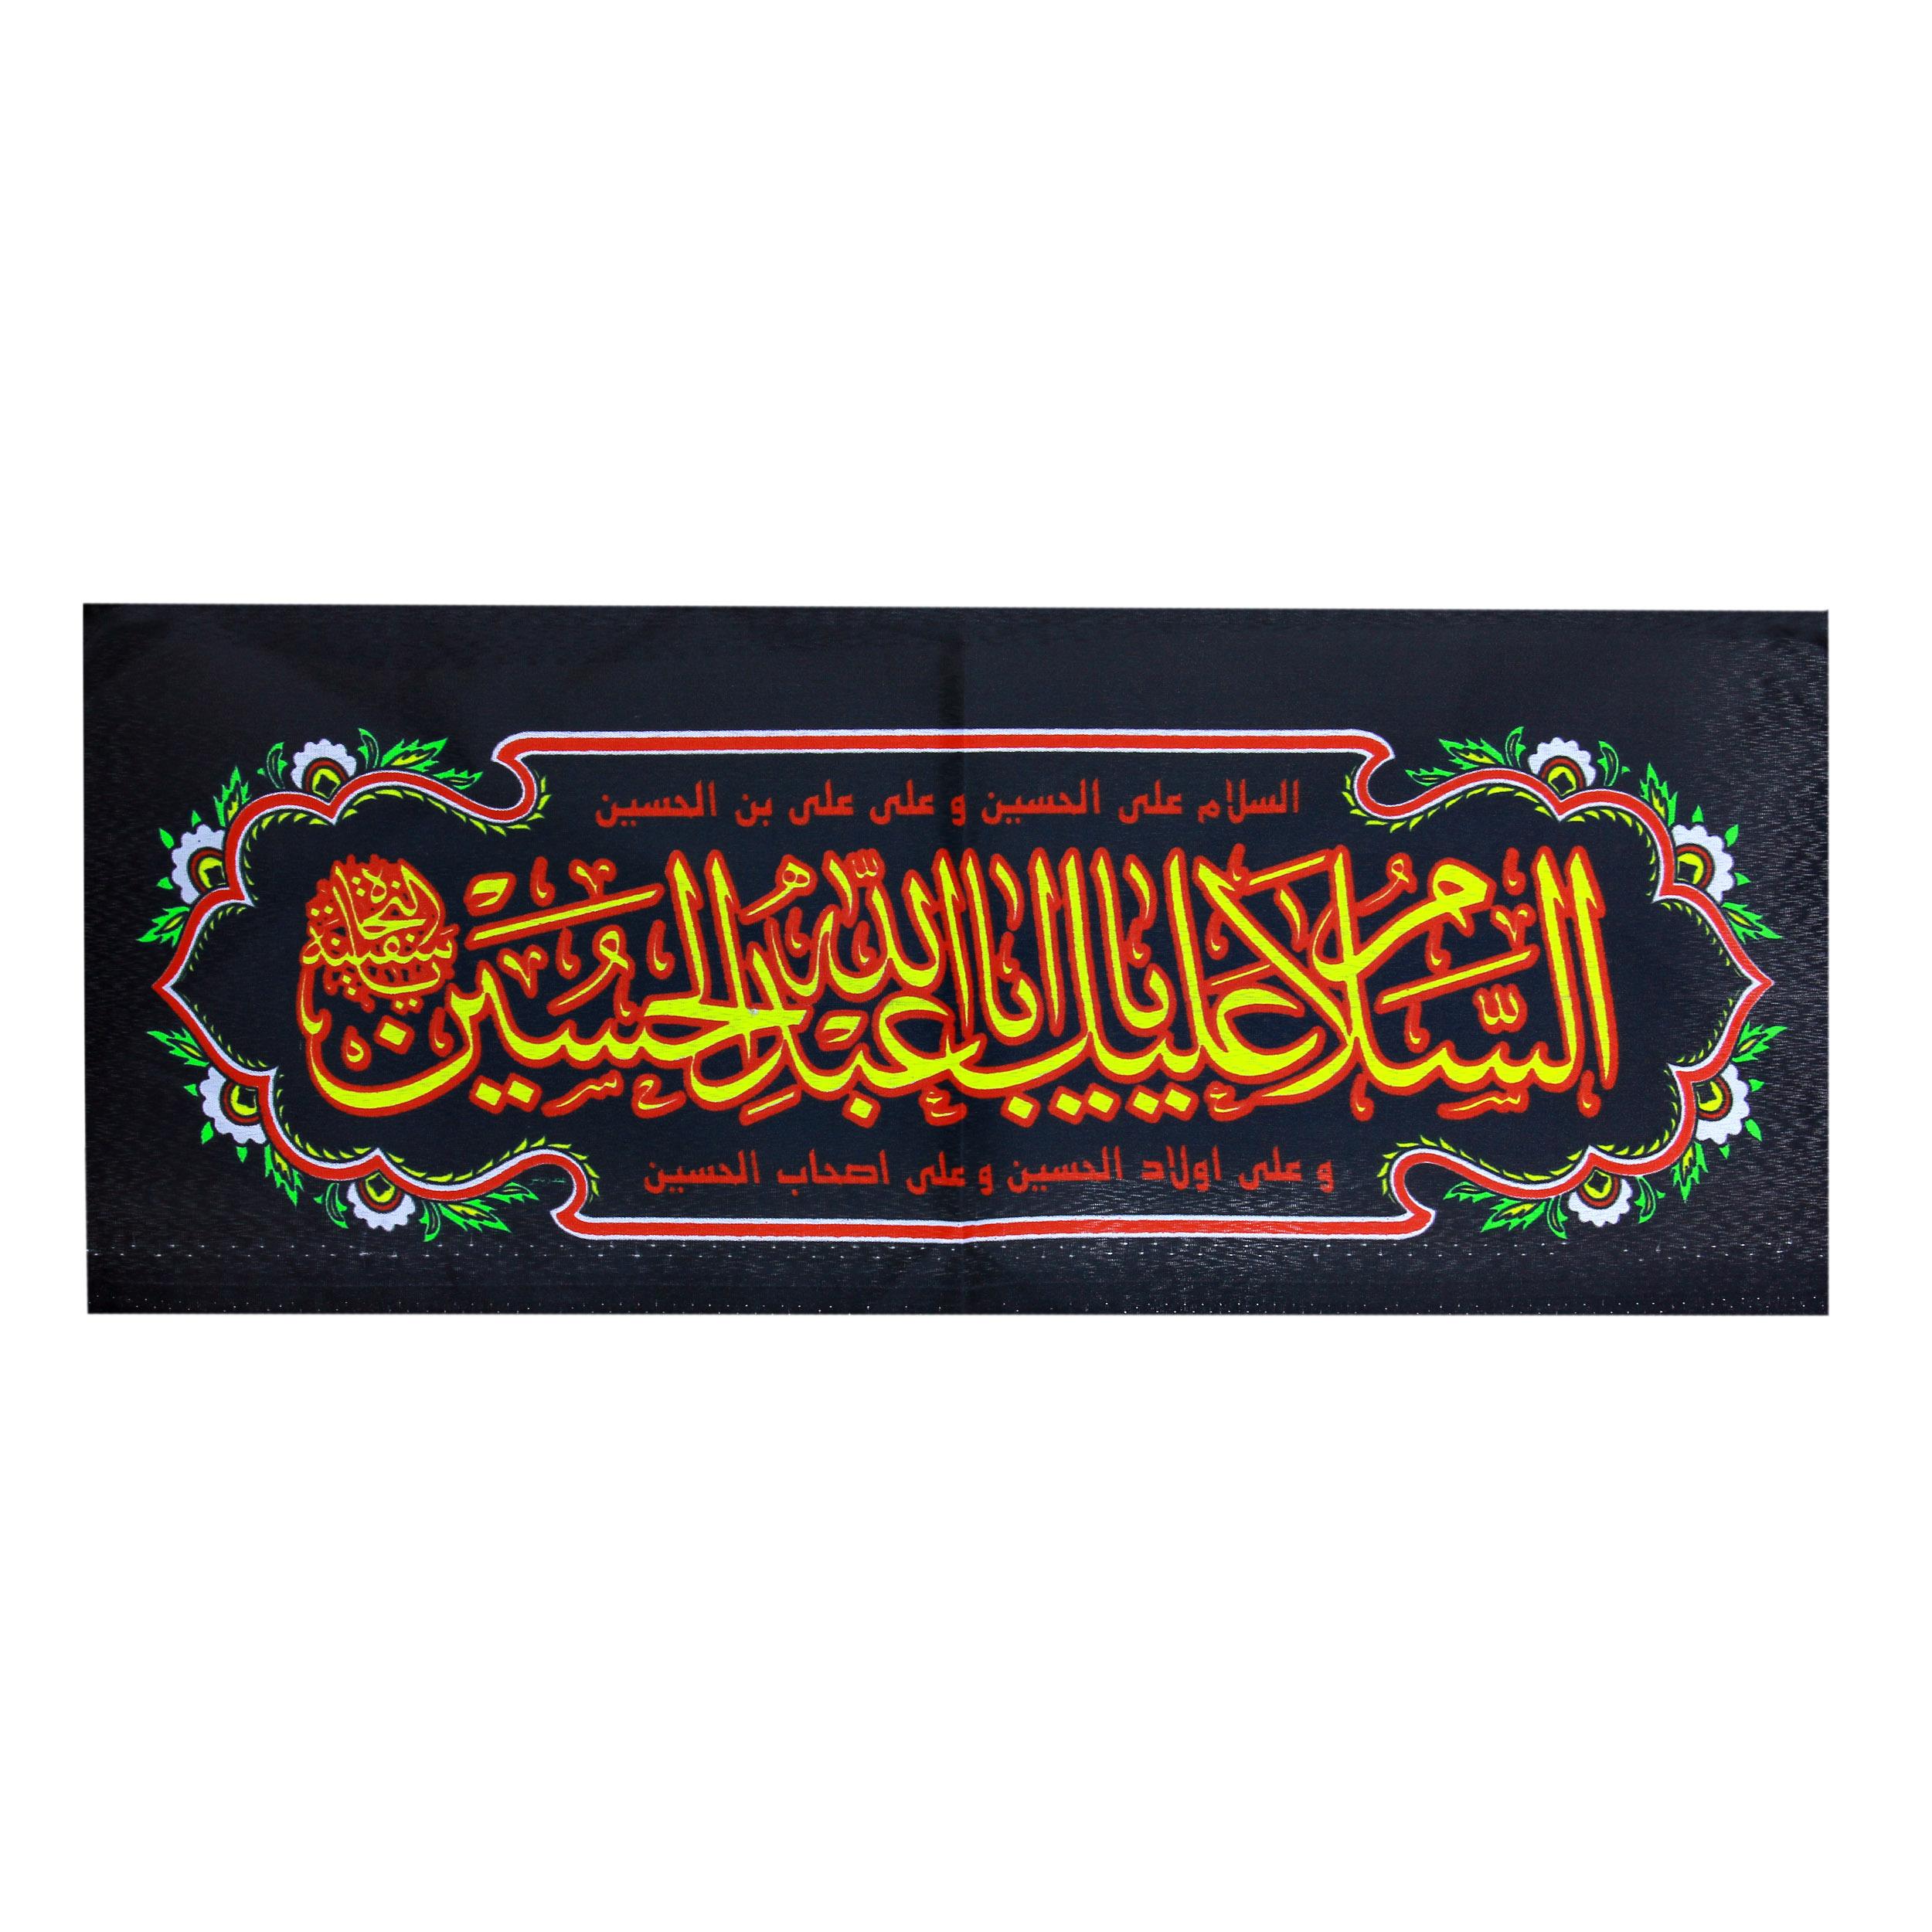 پرچم  بازرگانی میلادی مدل دیواری طرح السلام علیک یا ابا عبدالله الحسین علیه السلام کدPAR-075